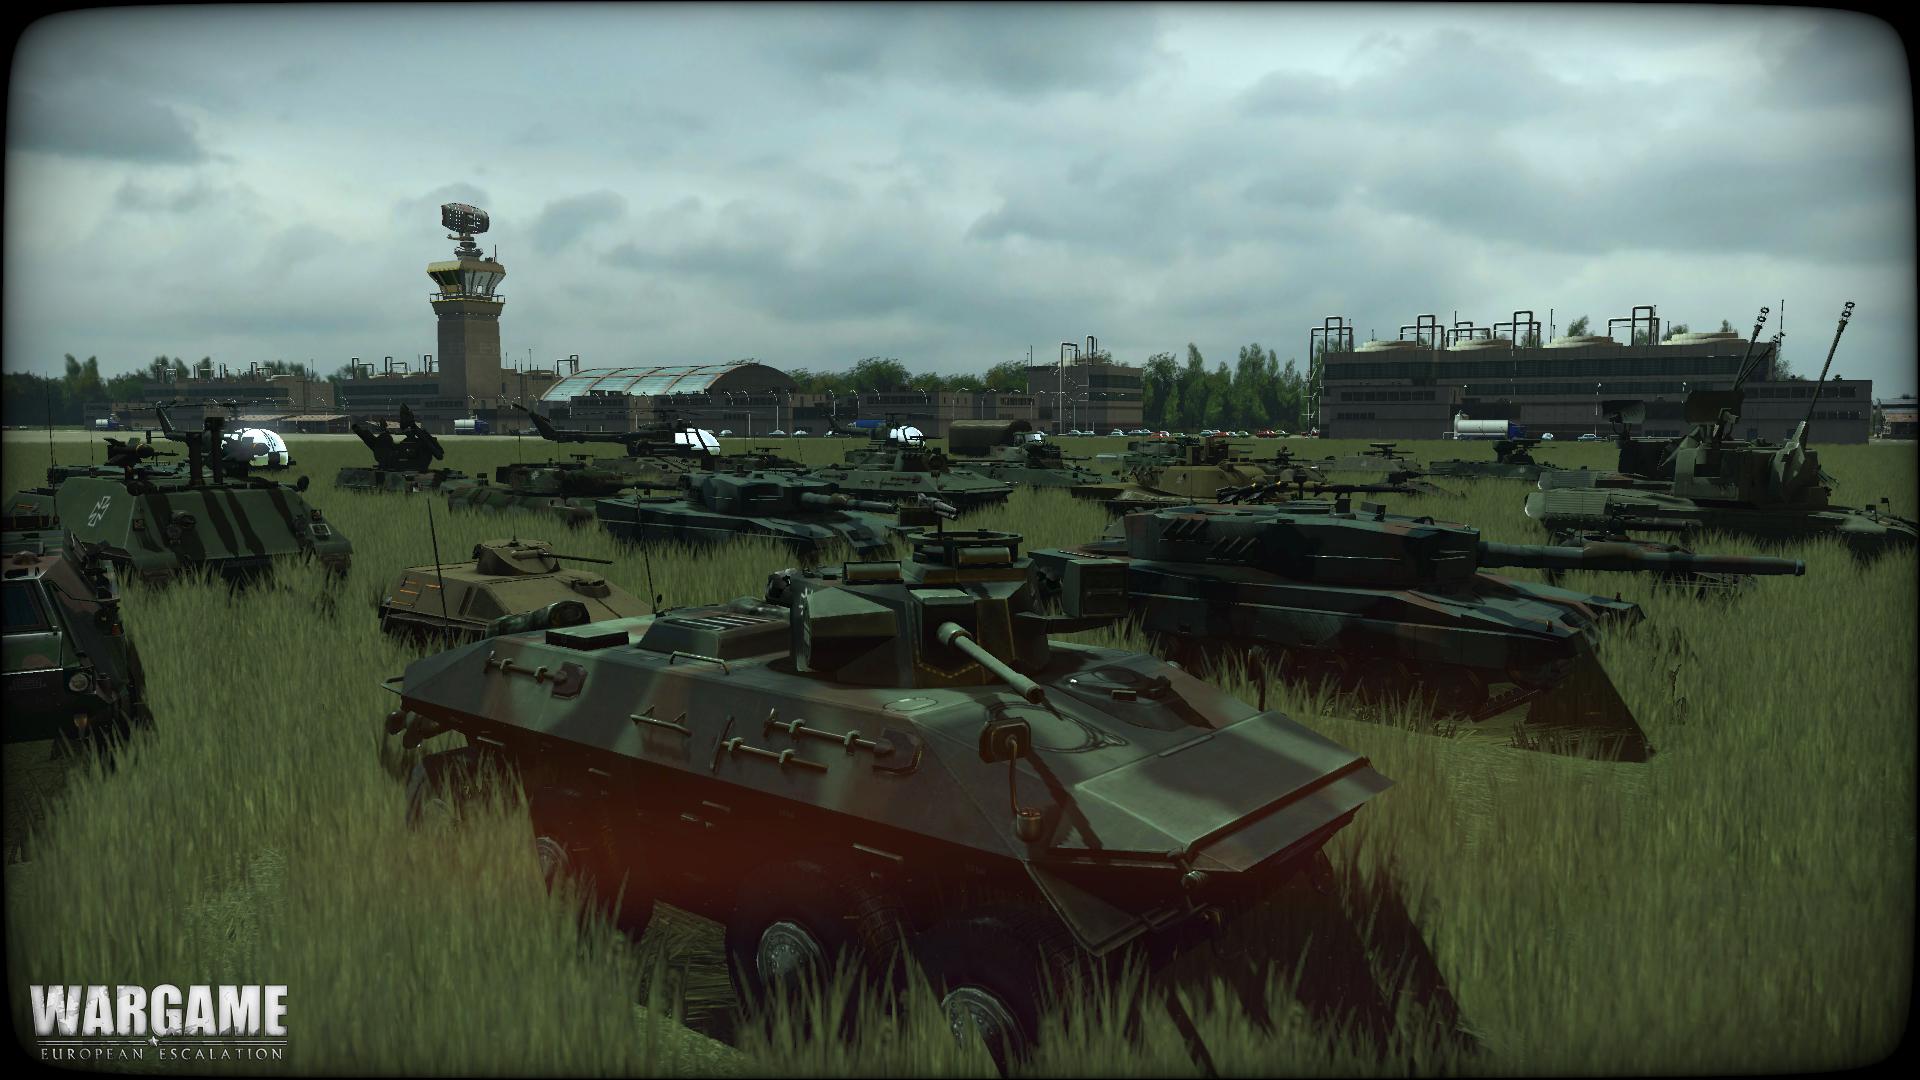 Obrázky z Wargame: European Escalation 59298